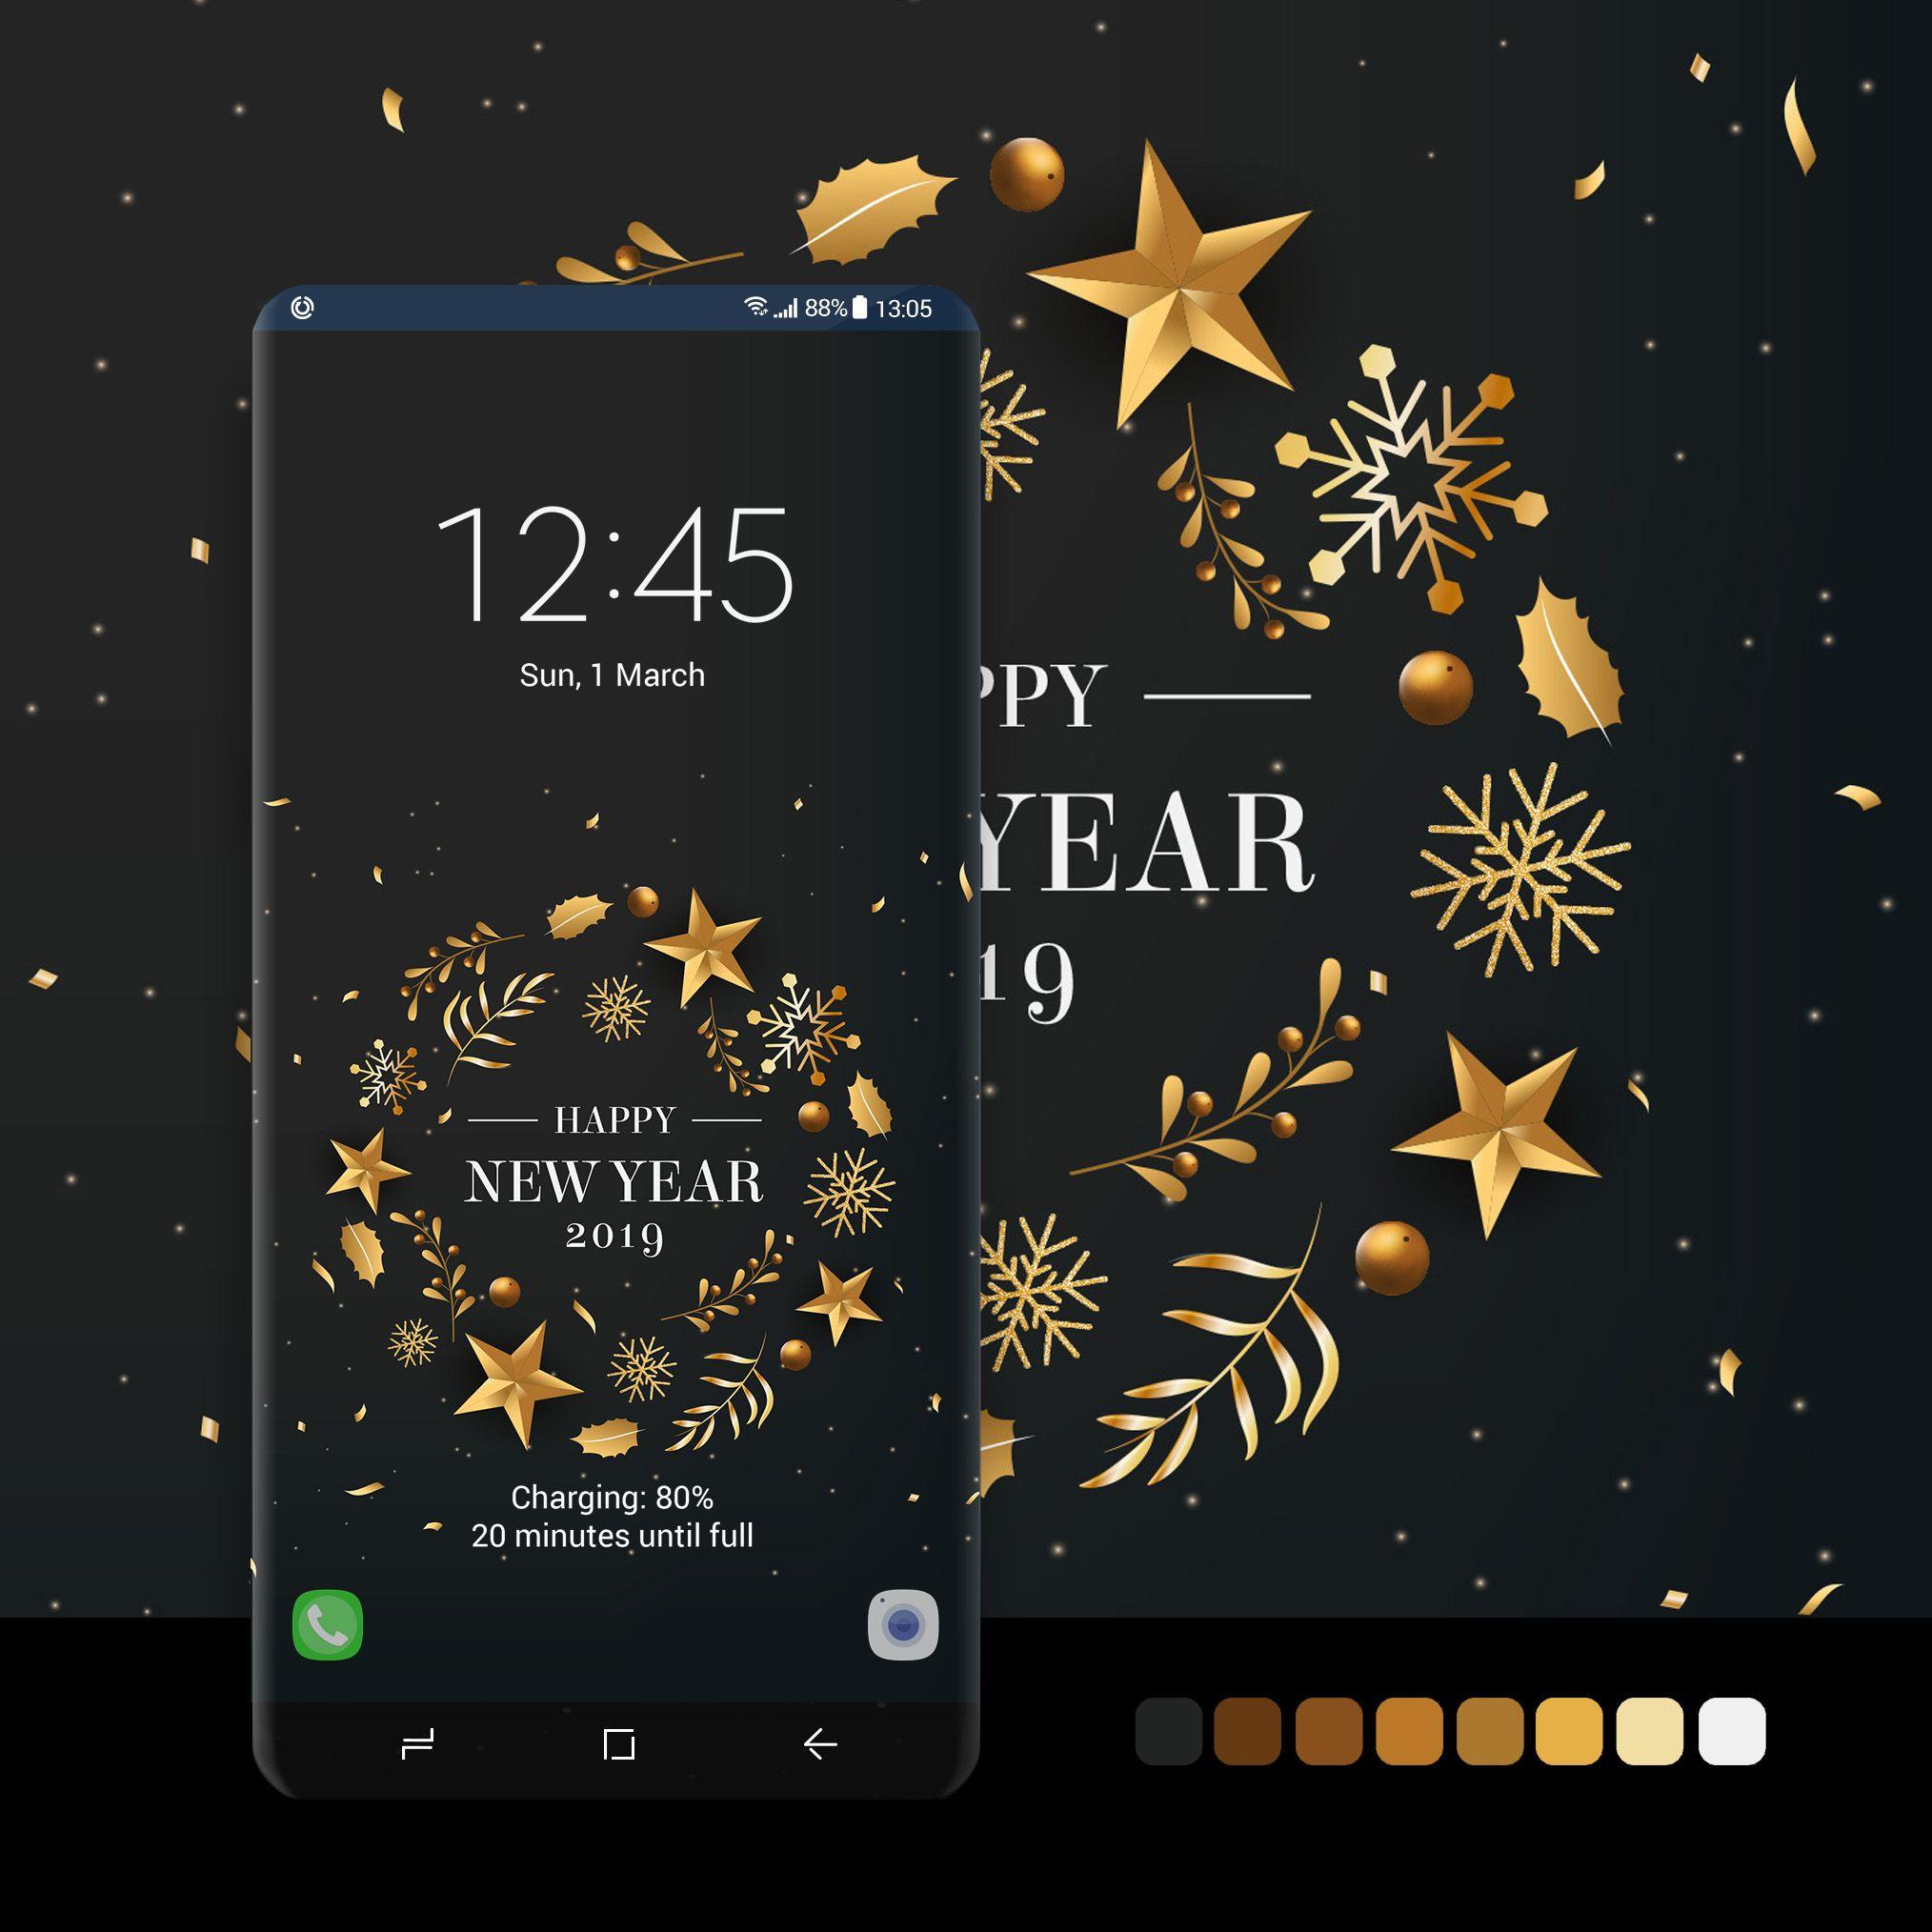 New Smartphone Wallpaper: #wallpaper, #android, #phone, #smartphone, #samsung